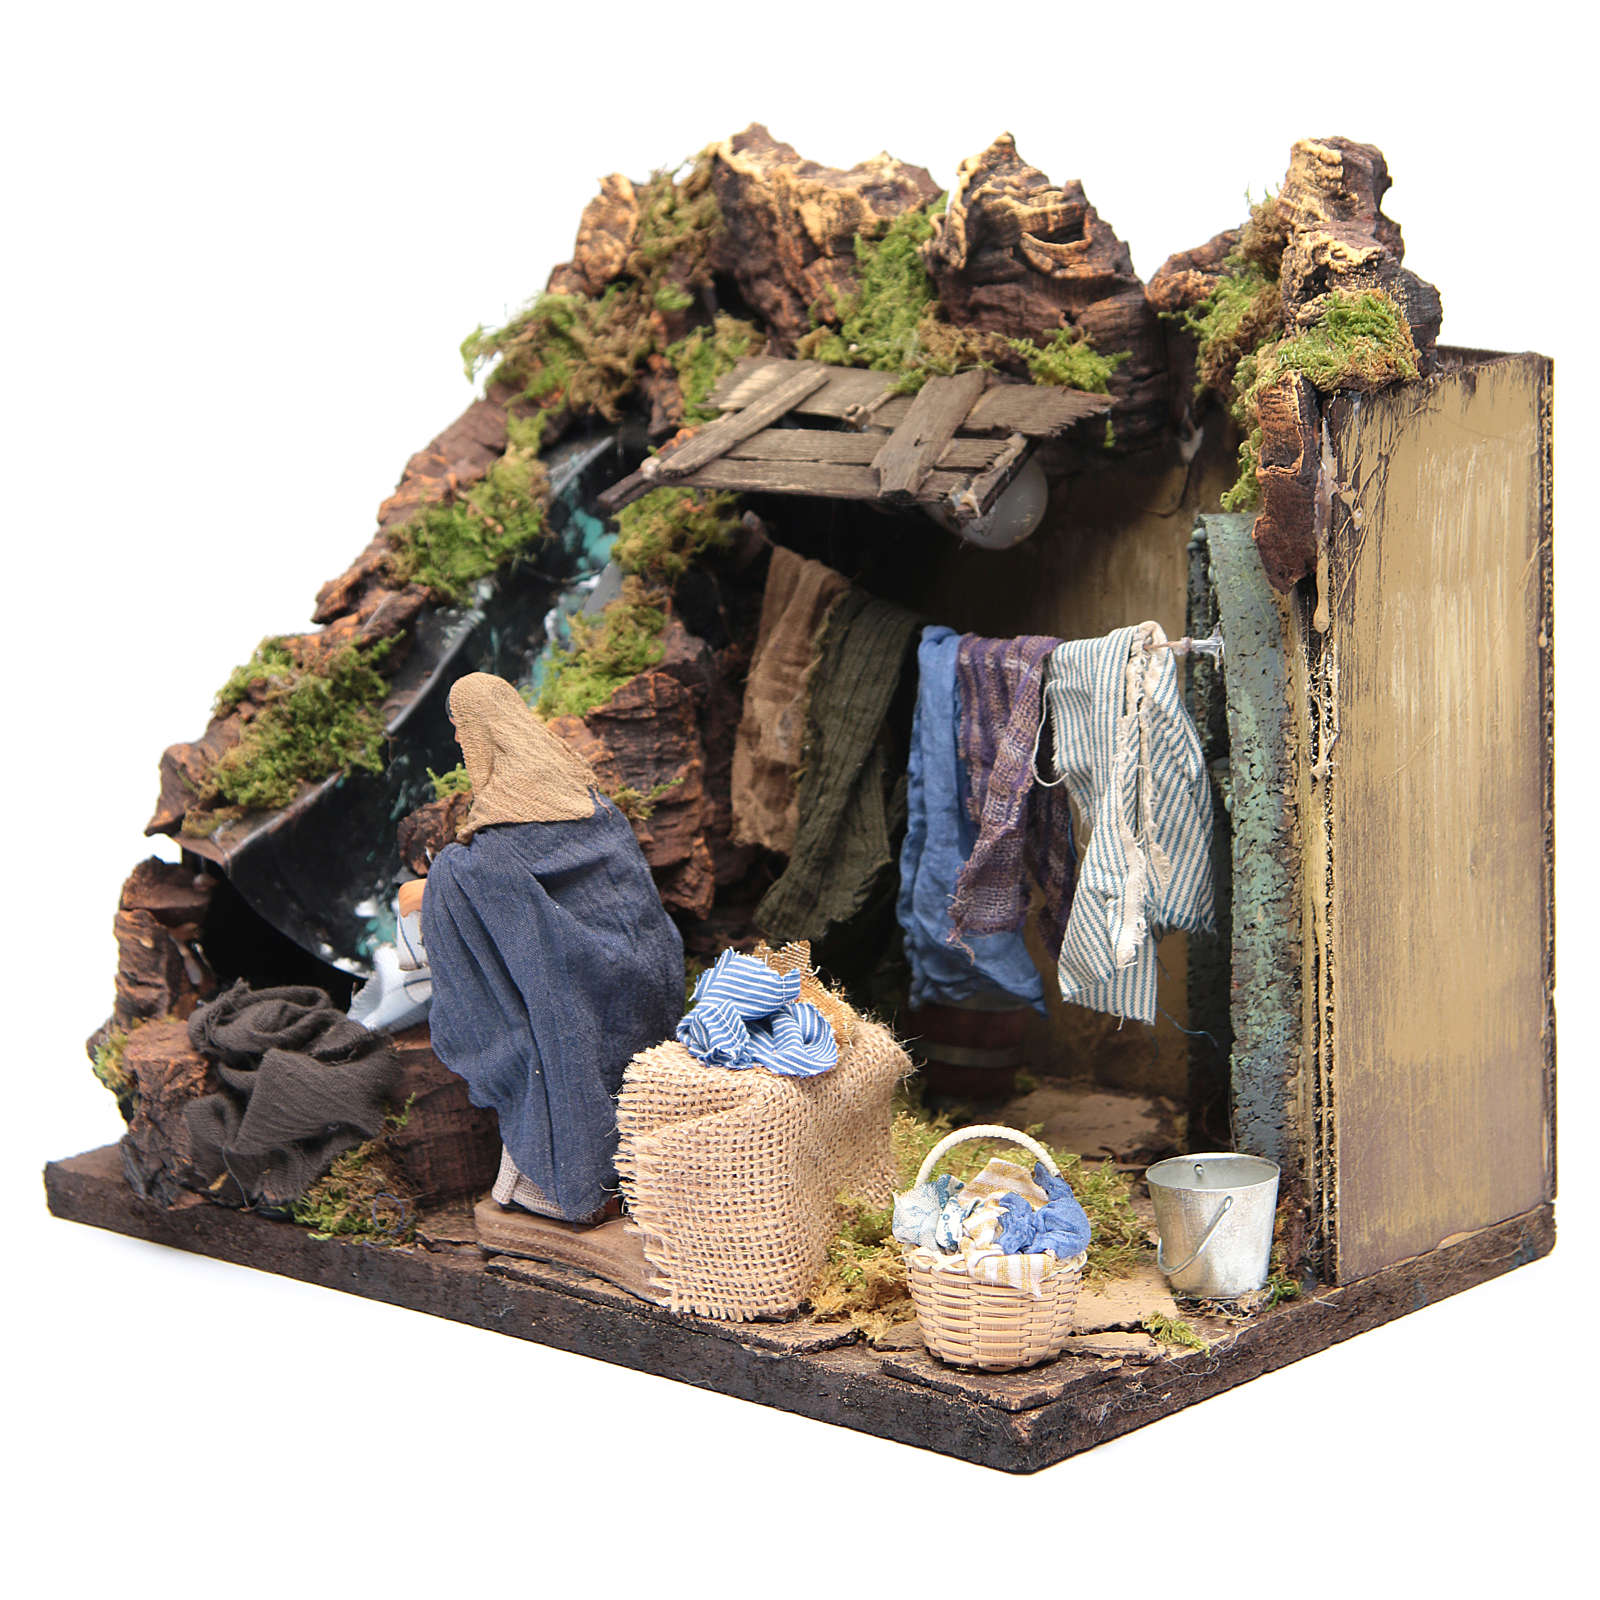 Animated Nativity scene figurine, laundress 12 cm 4